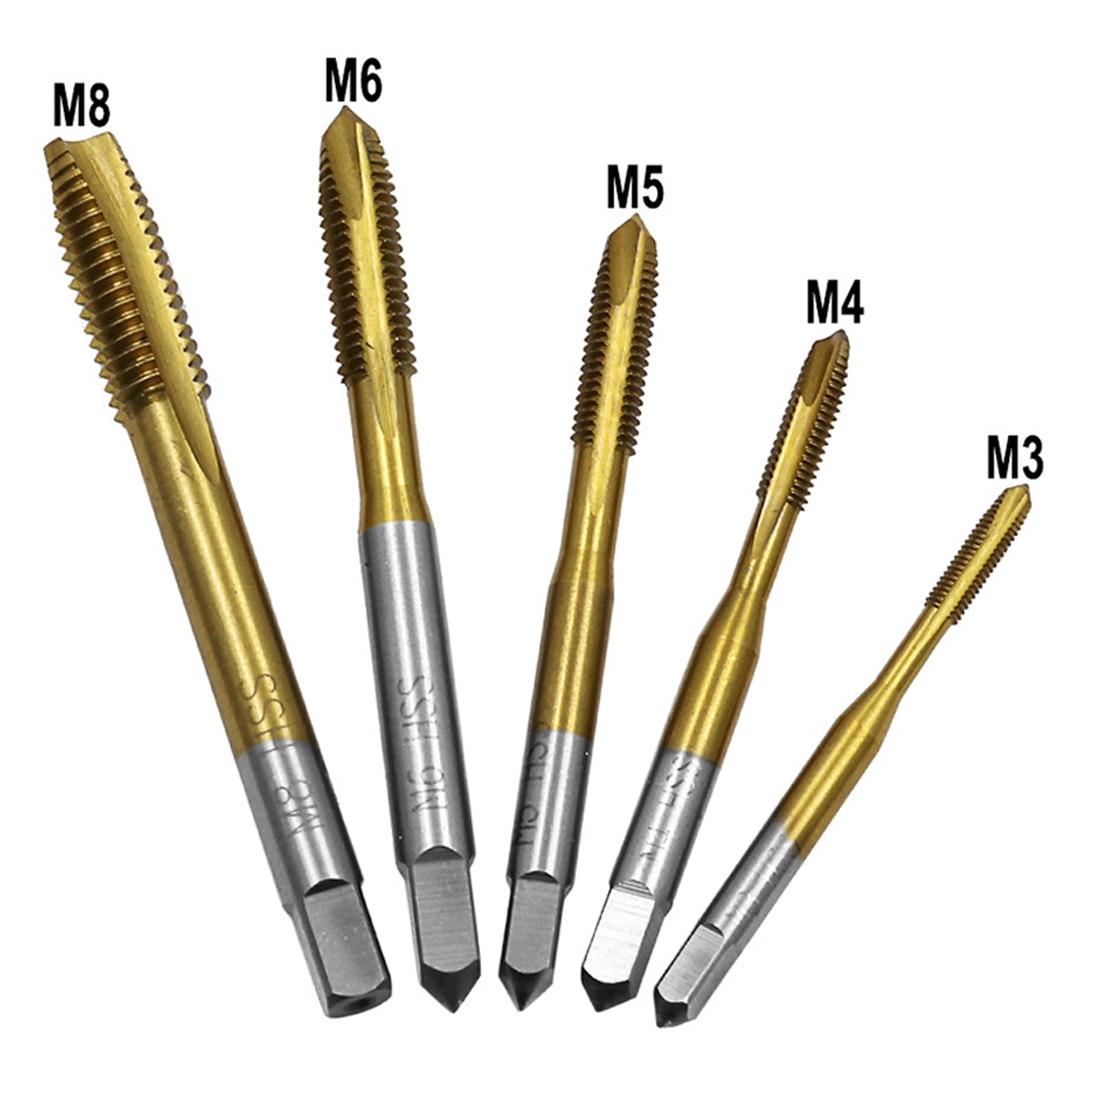 High Speed Steel Screw Tip M3-M8 Titanium Coated HSS Metric Straight Flute Thread Screw Tap Plug Tap